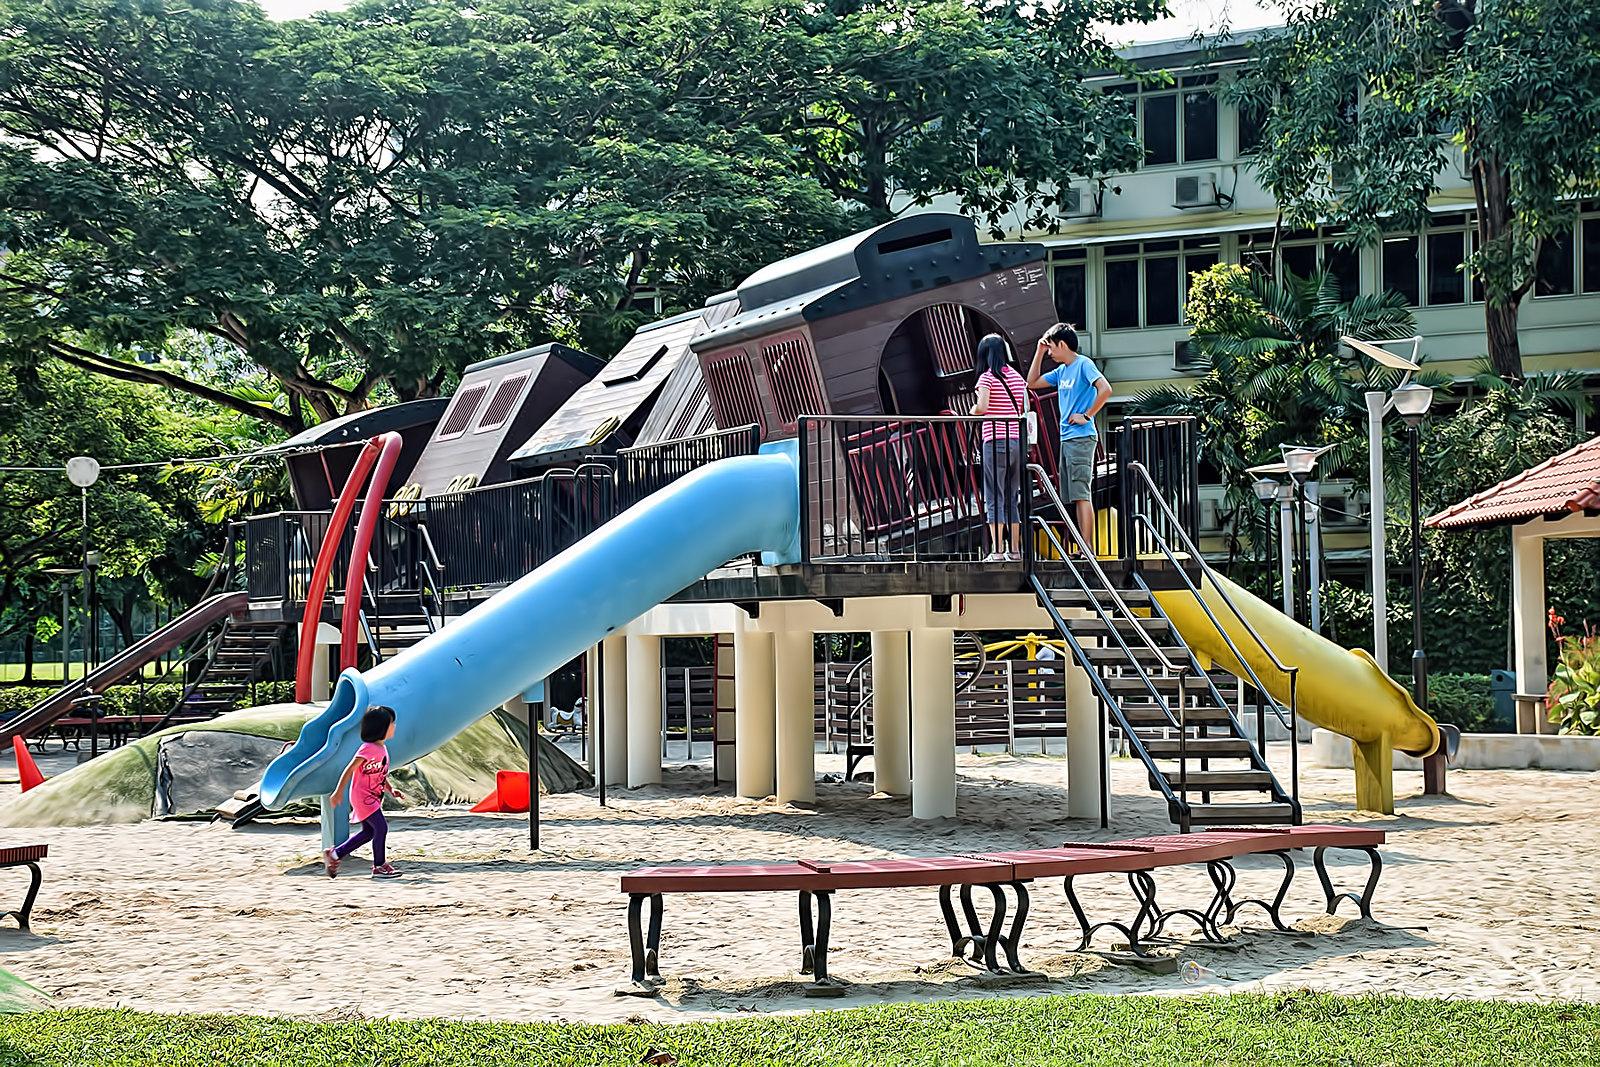 tiong bahru park outdoor playground singapore